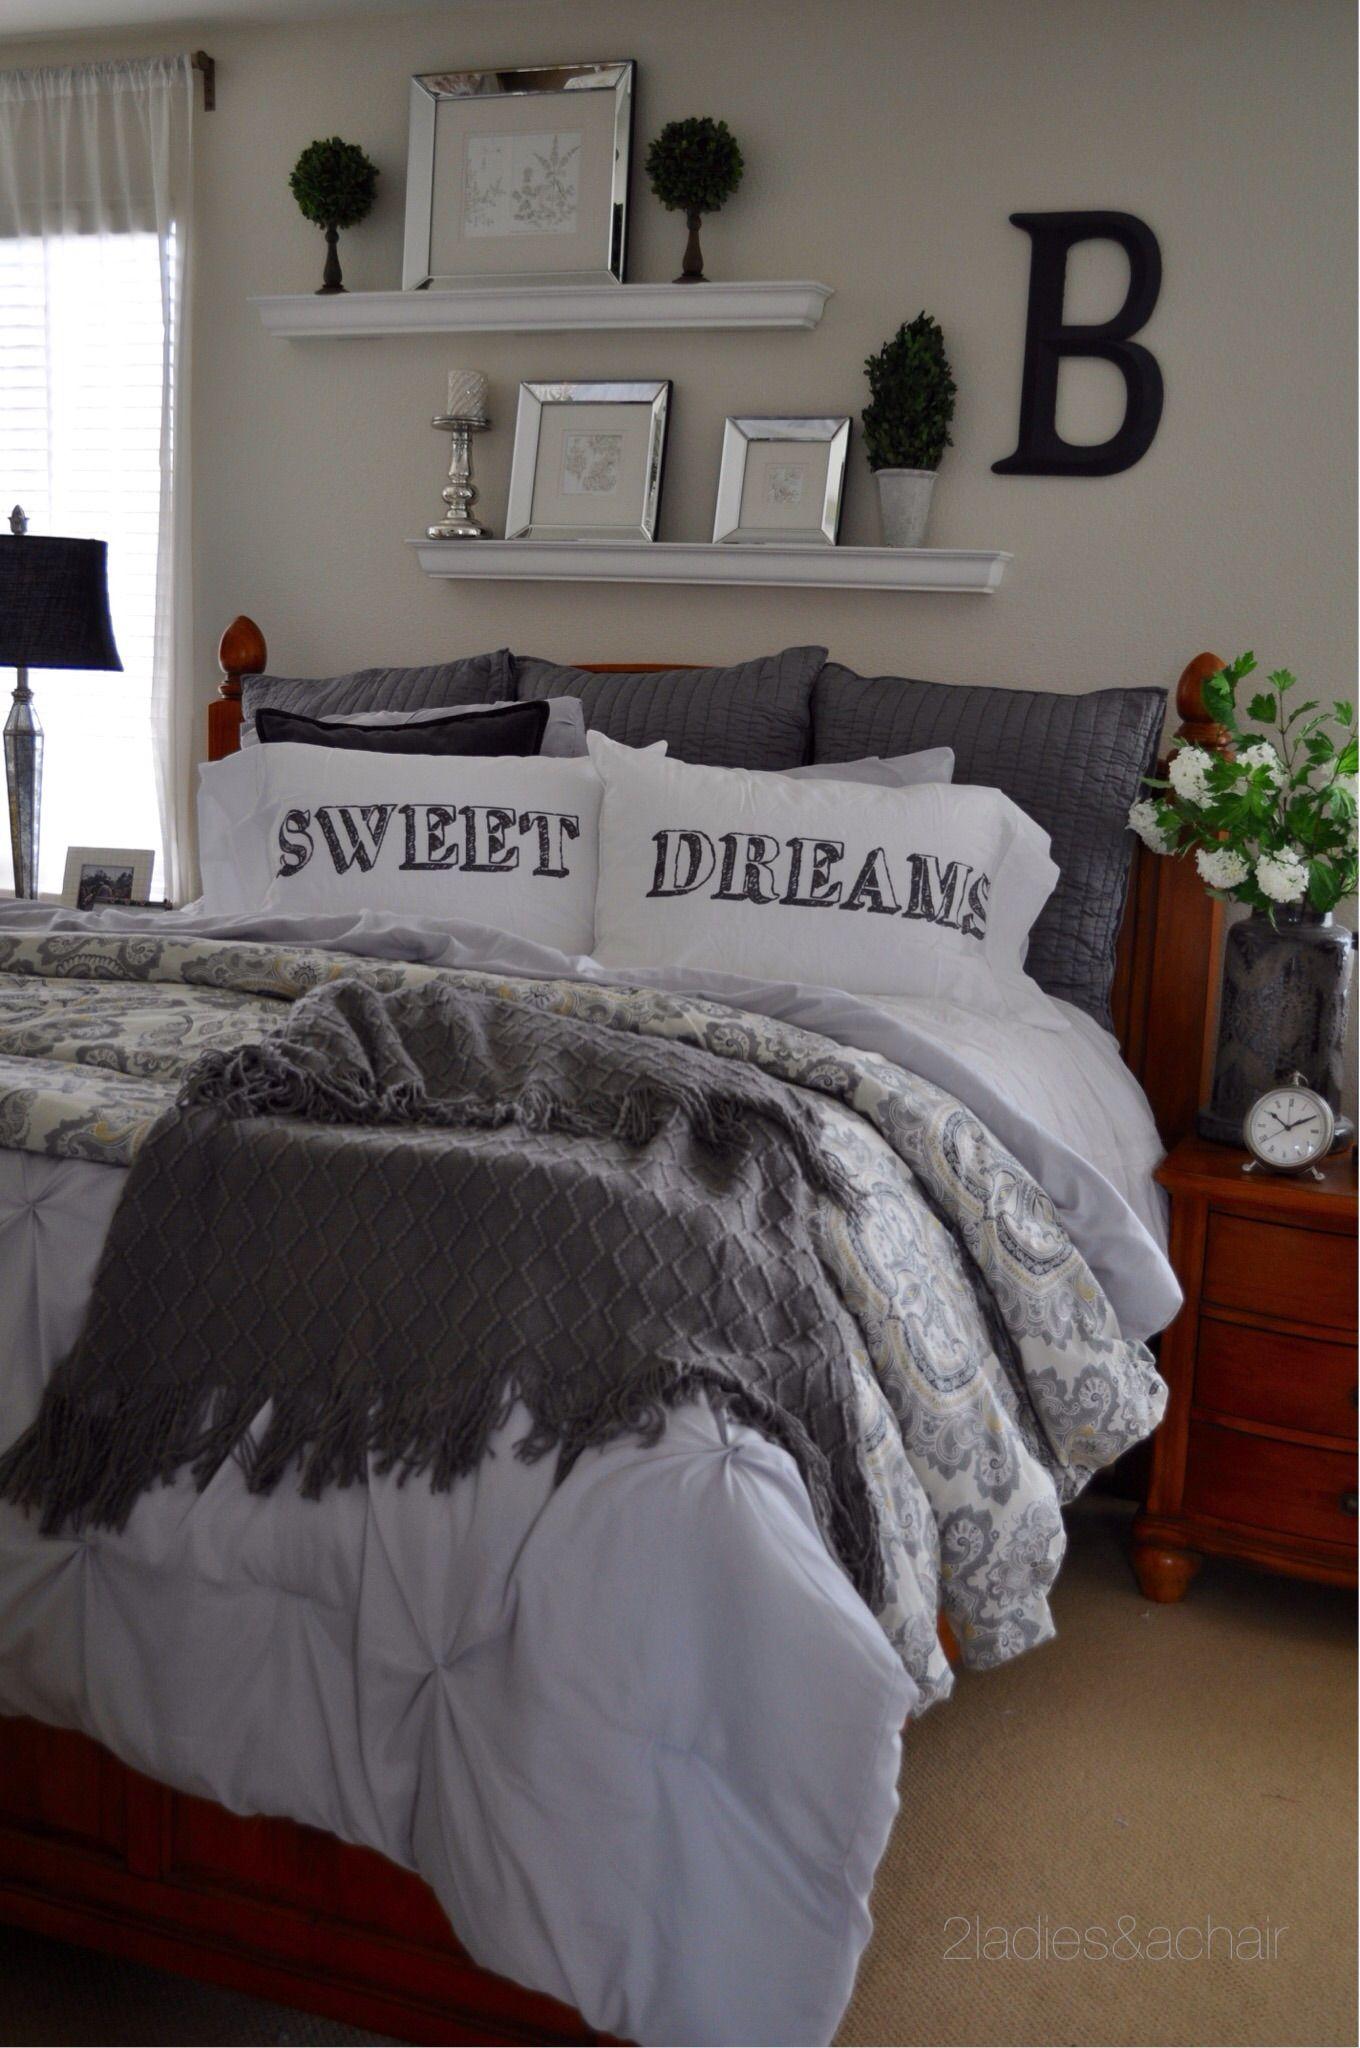 Jun sweet dreams topiary comforter and backdrops